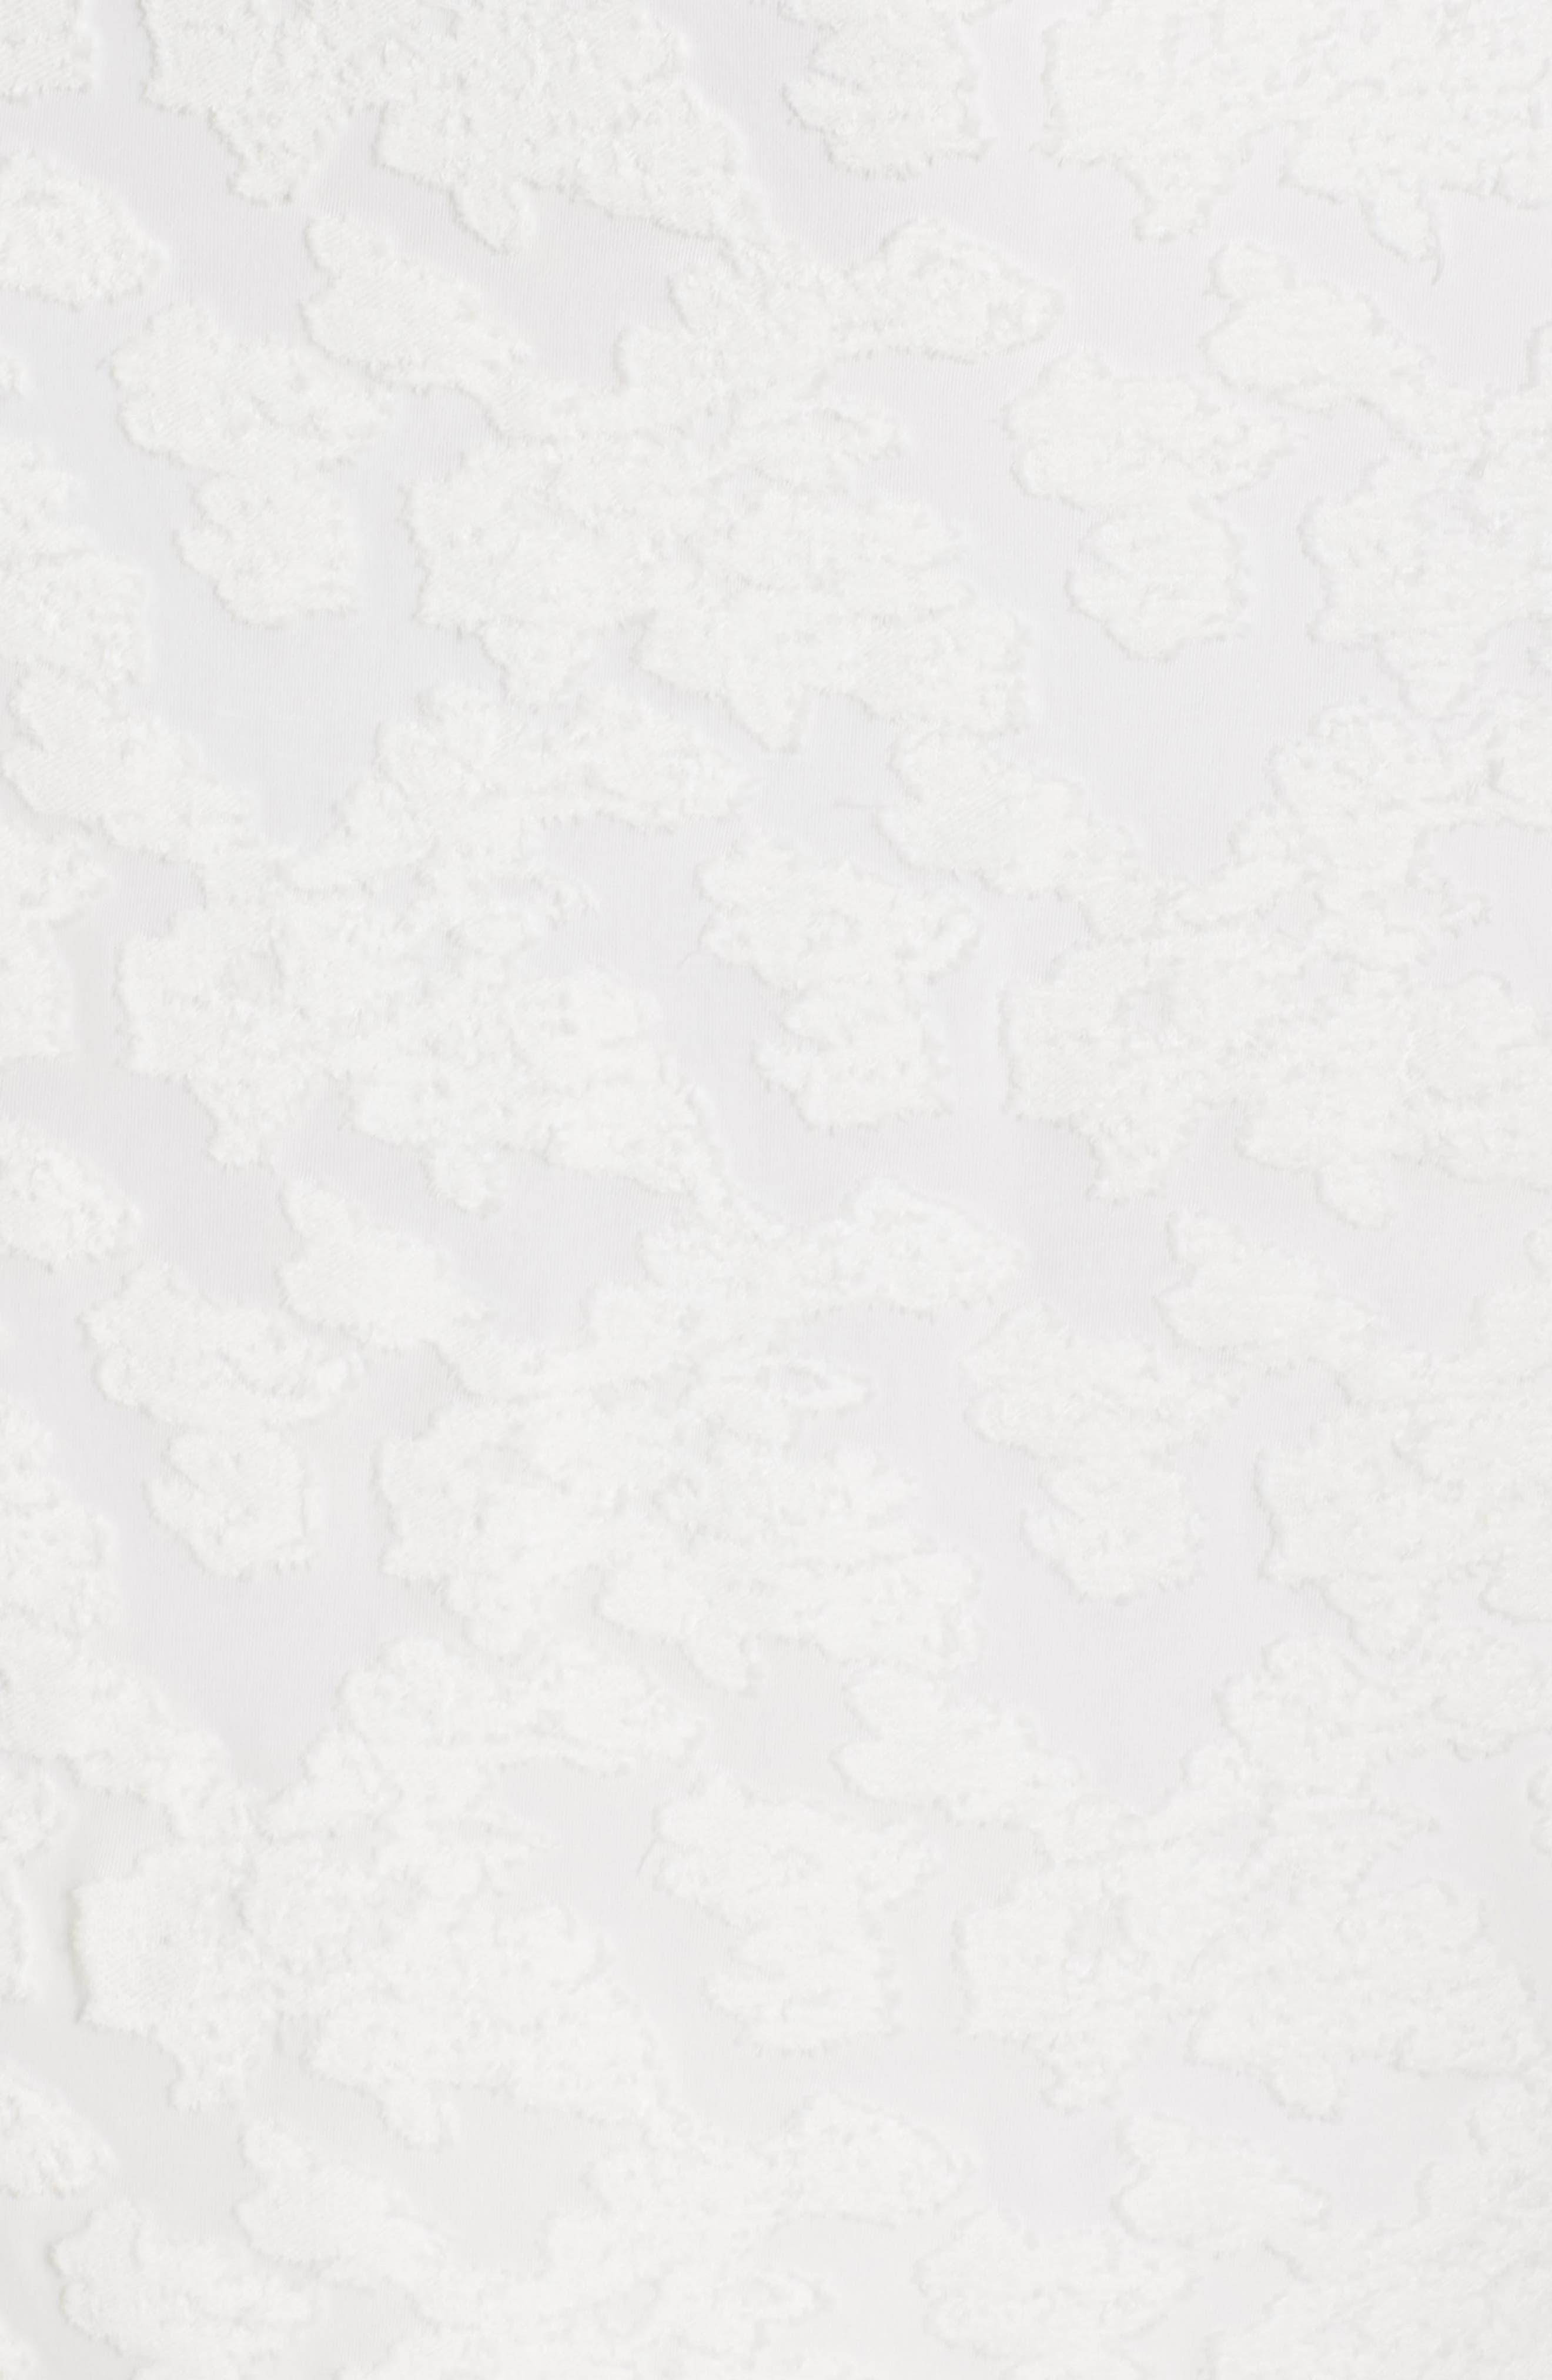 ALI & JAY, Big Mistake Short Sleeve Sheath Dress, Alternate thumbnail 6, color, WHITE FLORAL